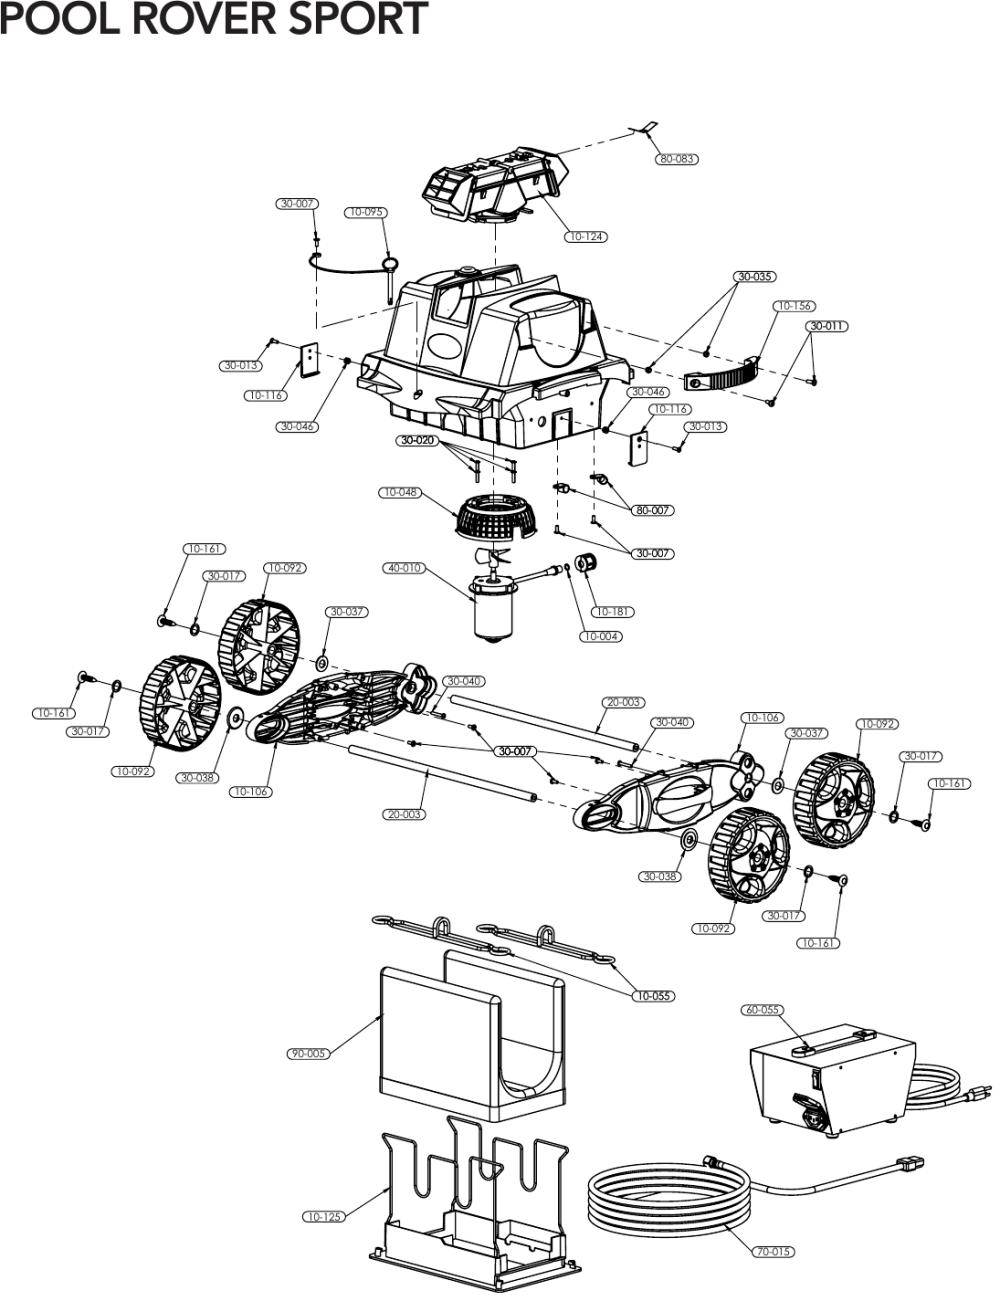 medium resolution of aquabot pool rover sport parts